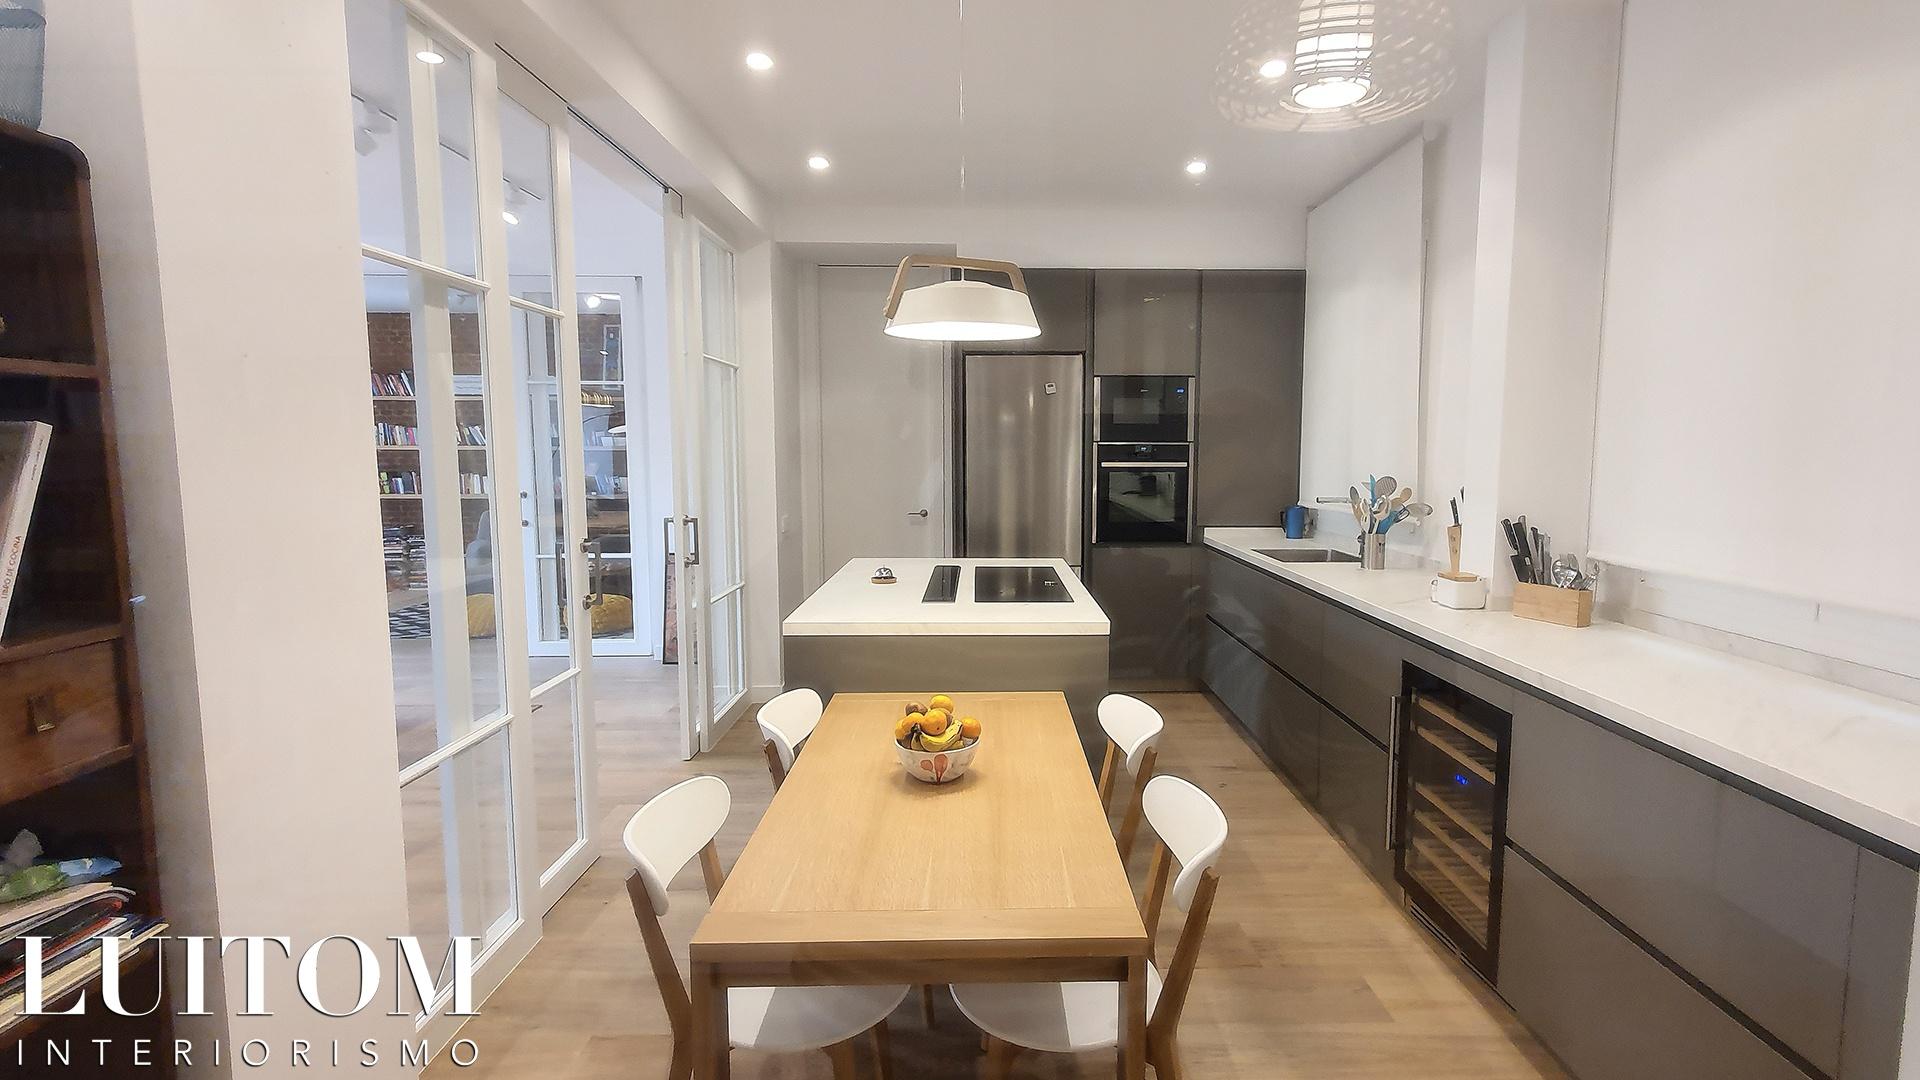 cristaleras-cocinas-pared-cristal-separacion-cocina-salon-cristalera-metalica-madera-blanca-negra-04